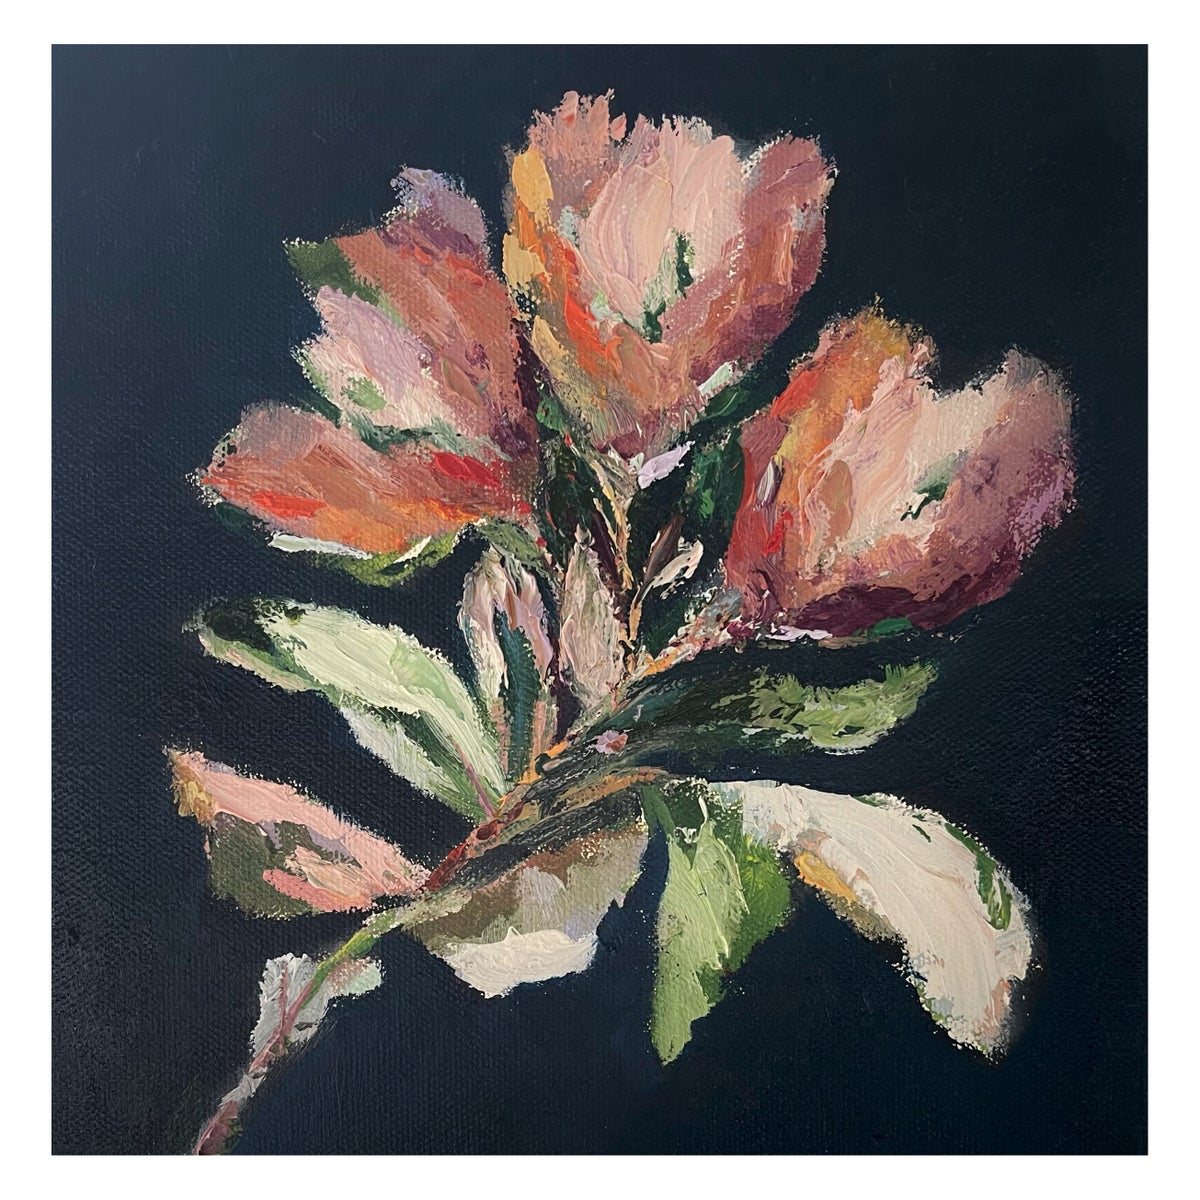 Image of 'Botanique I I' Oil on canvas